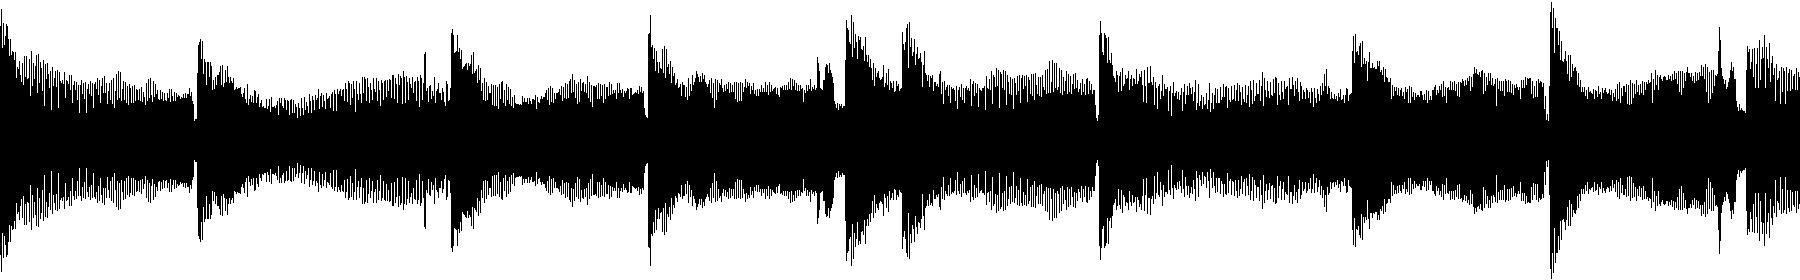 vedh melodyloop 101 gmaj7 9 em7 9 bm a fm 122bpm